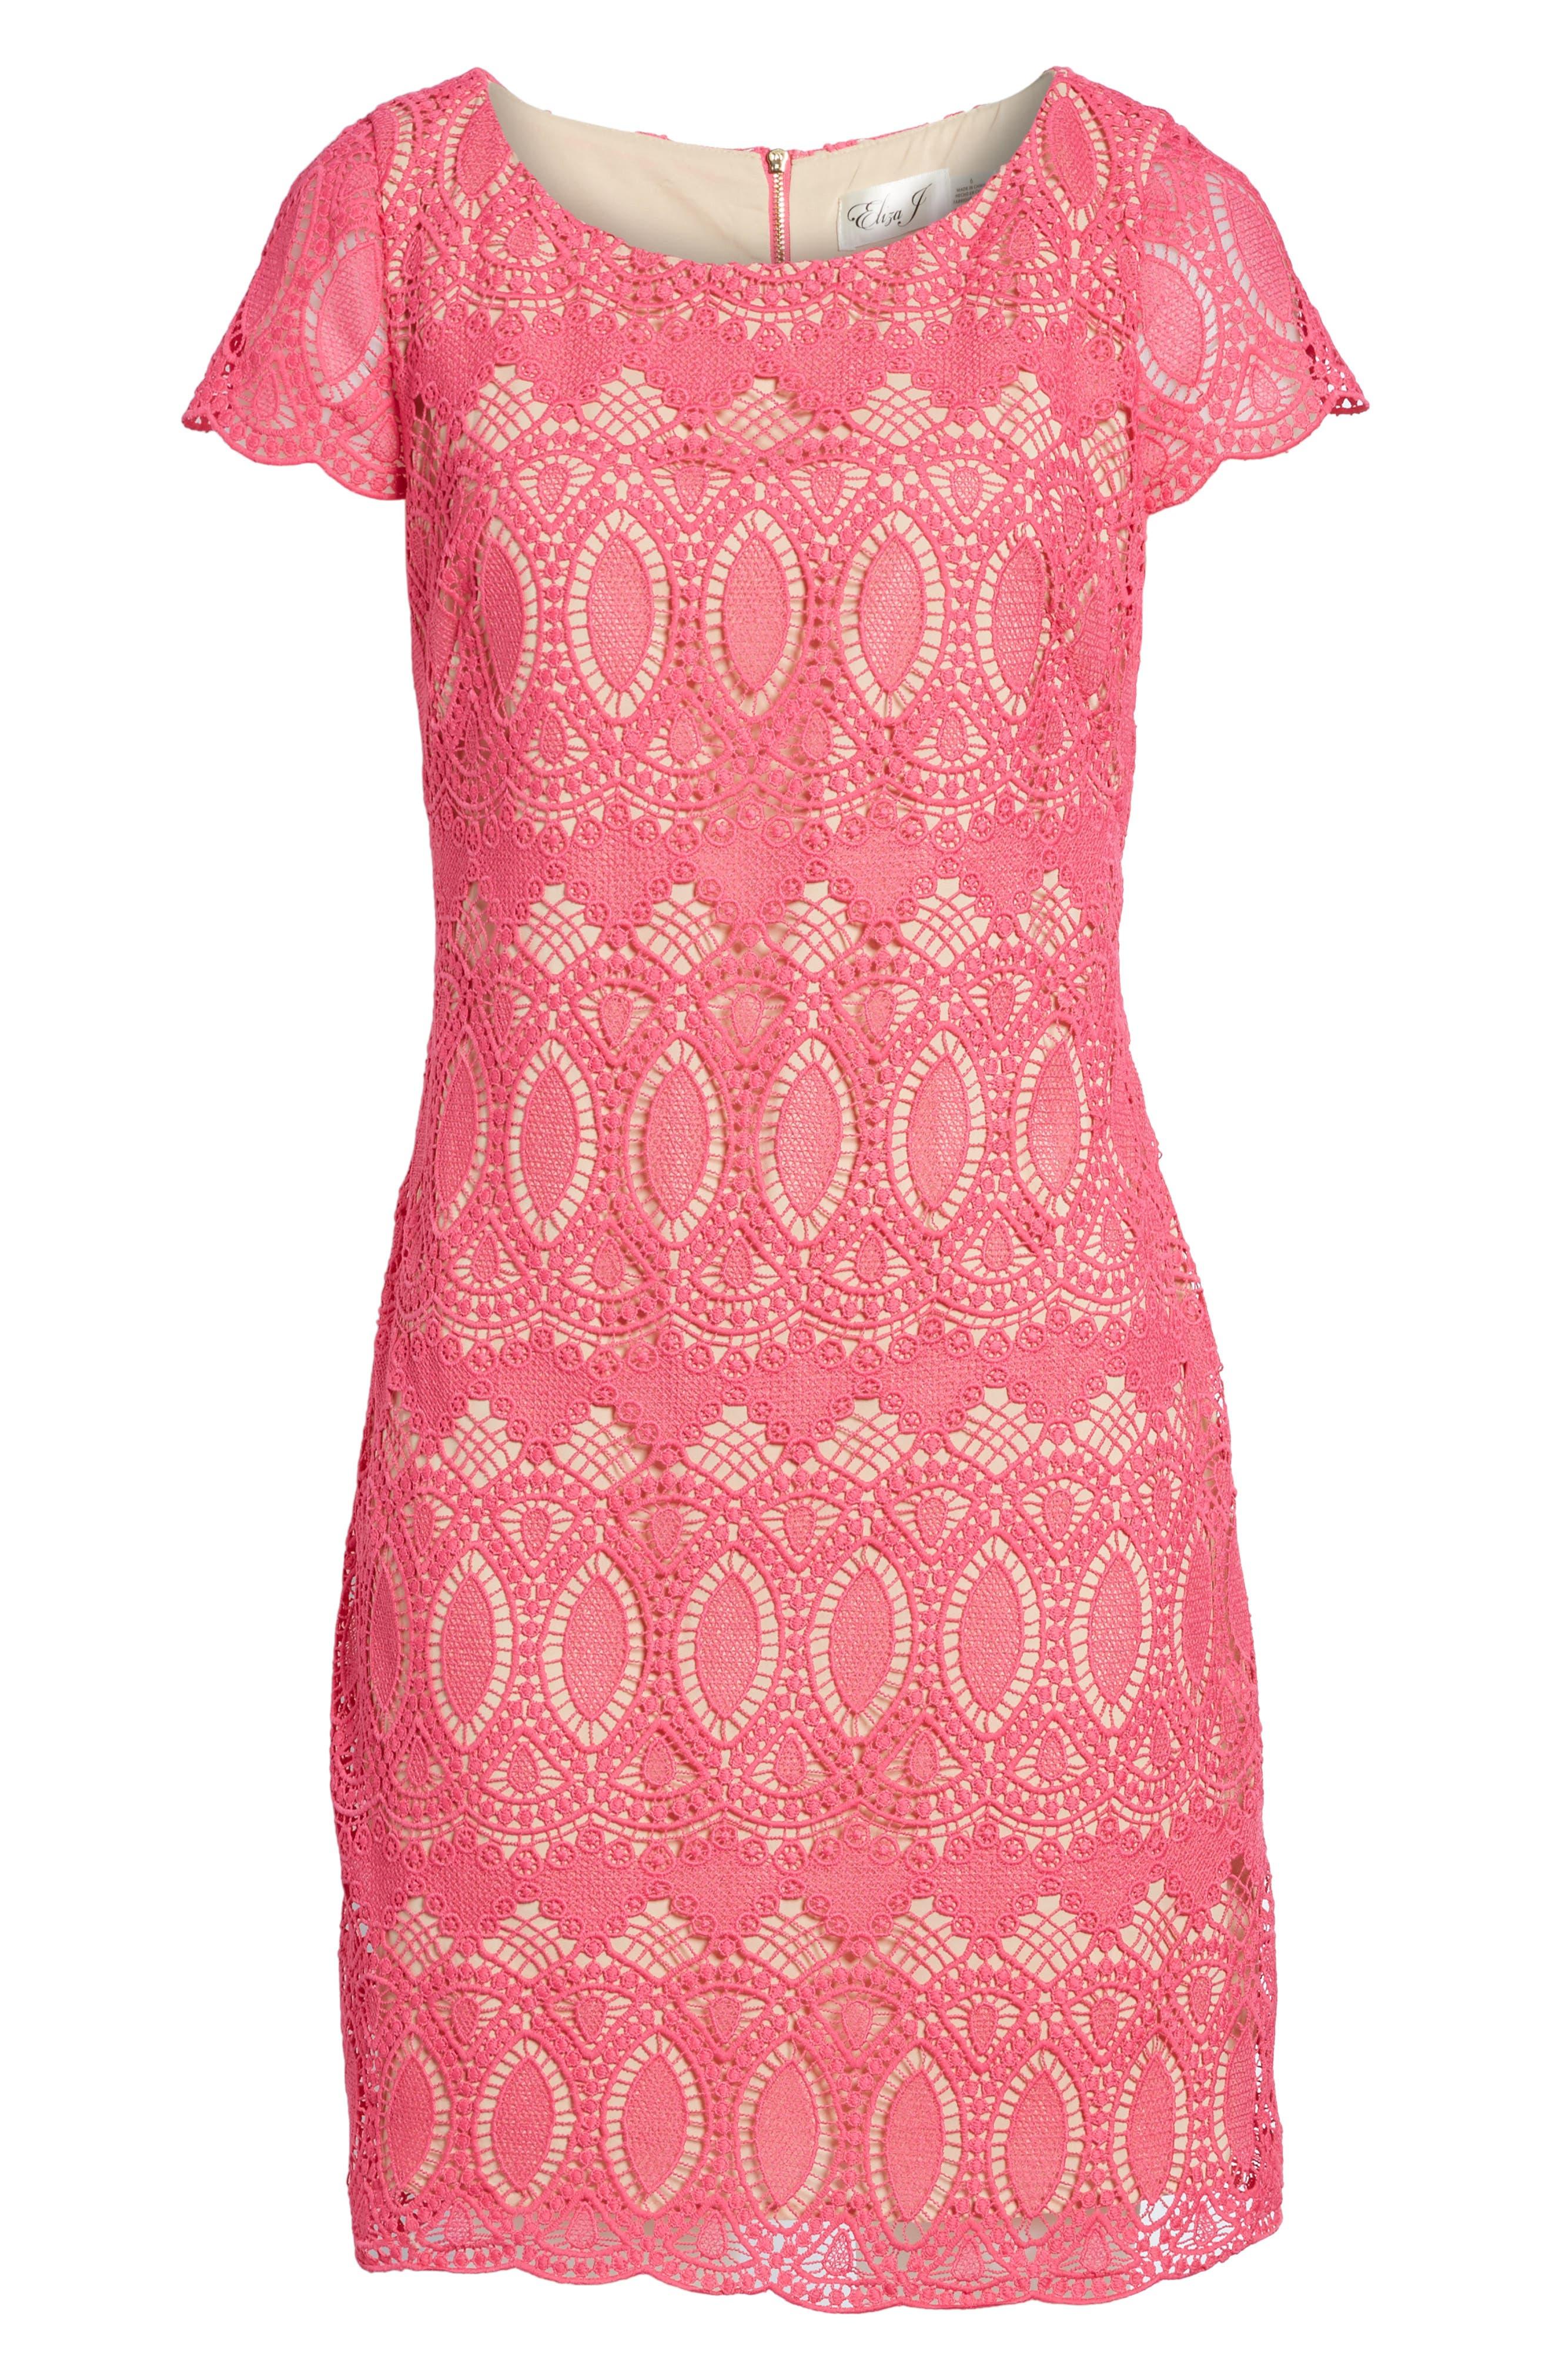 Scalloped Lace Sheath Dress,                             Alternate thumbnail 2, color,                             660